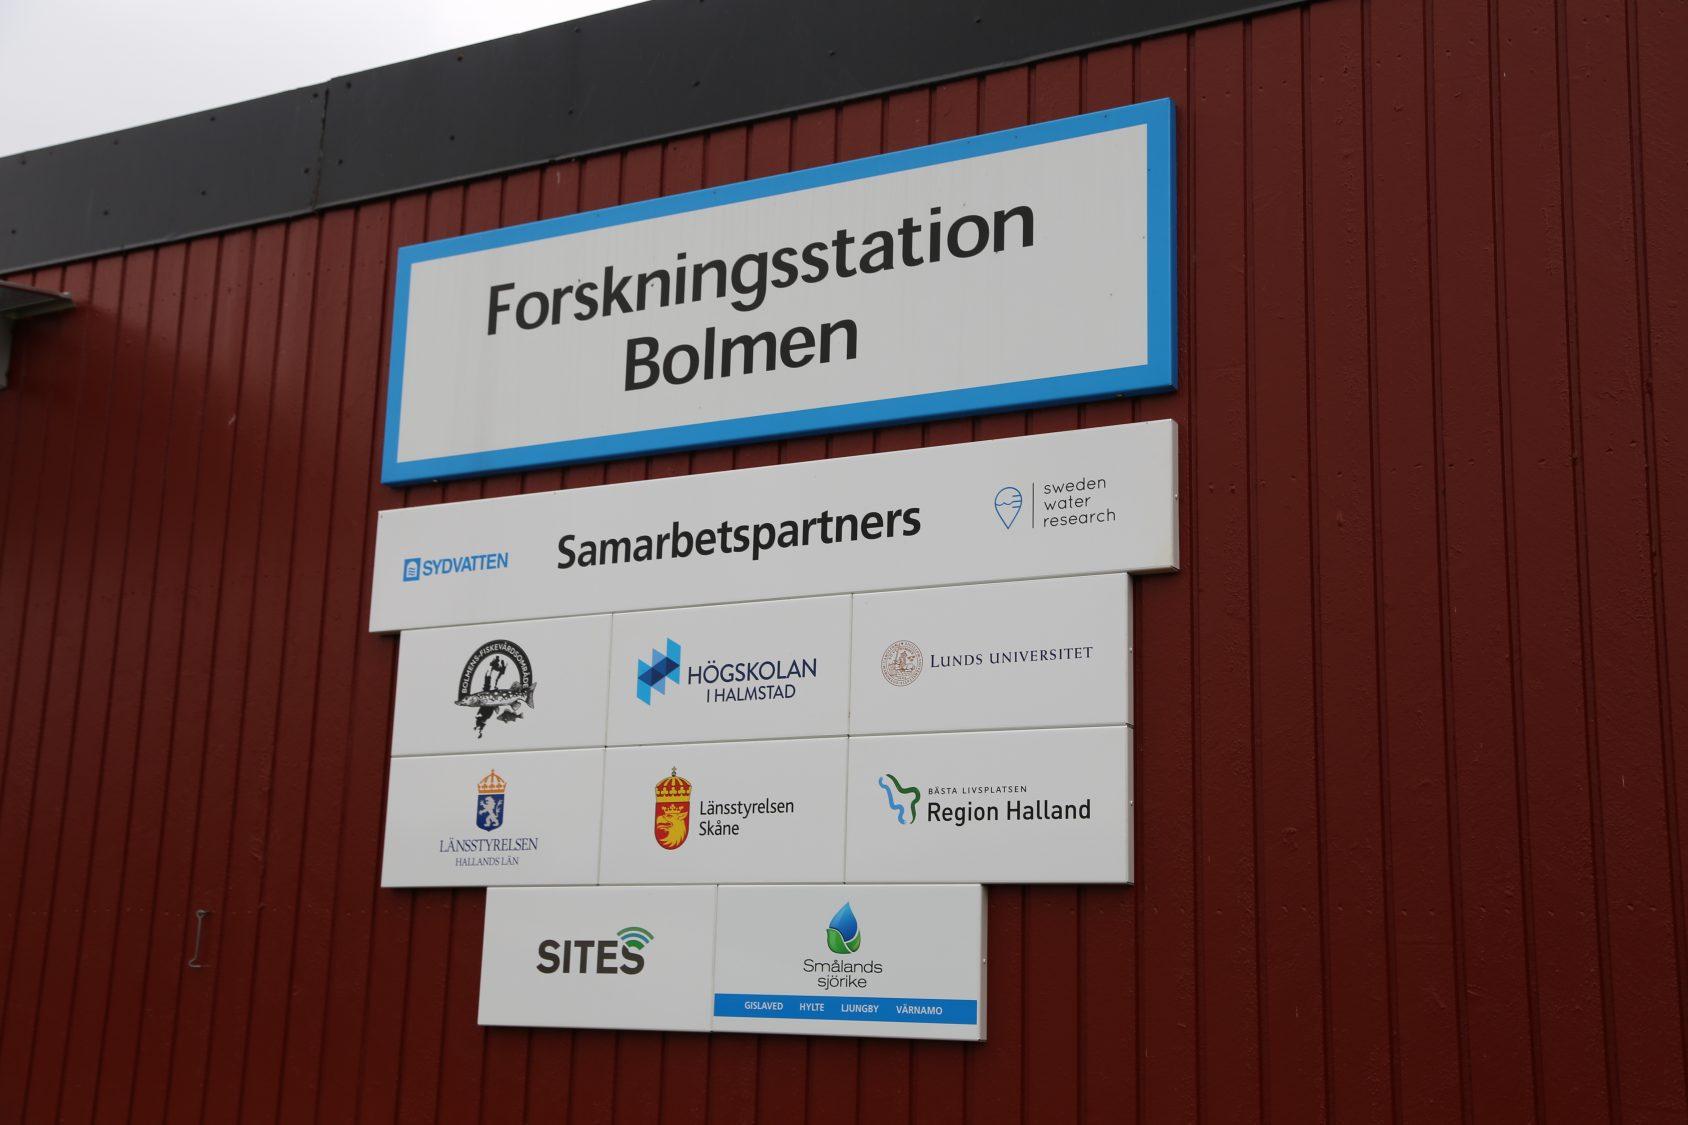 Forskningsstation Bolmen, smarbetspartners